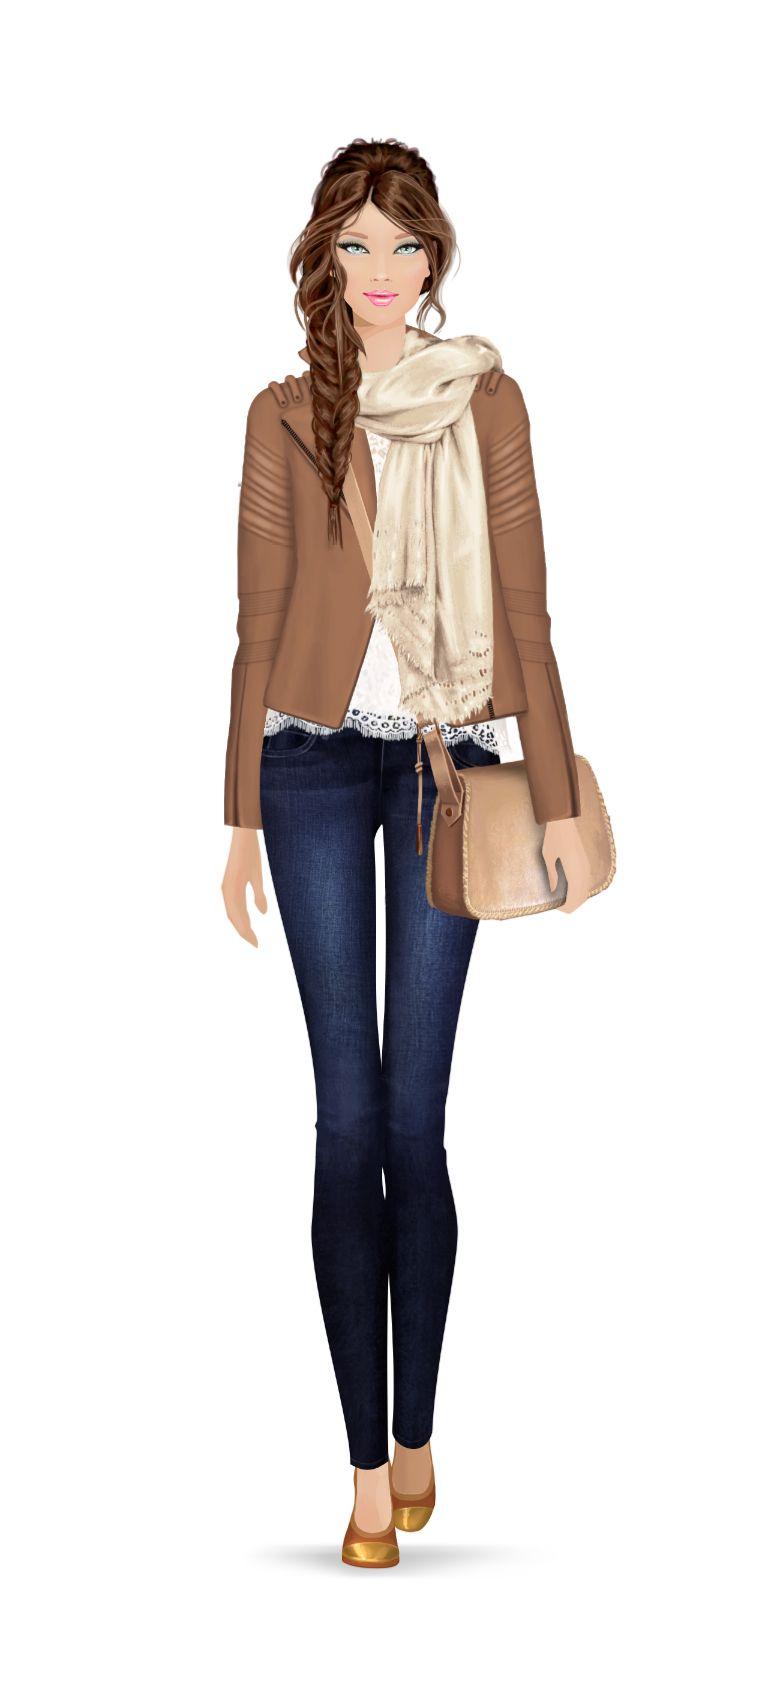 Fashion Game outfit super cute!!! #Covet fashion game ...